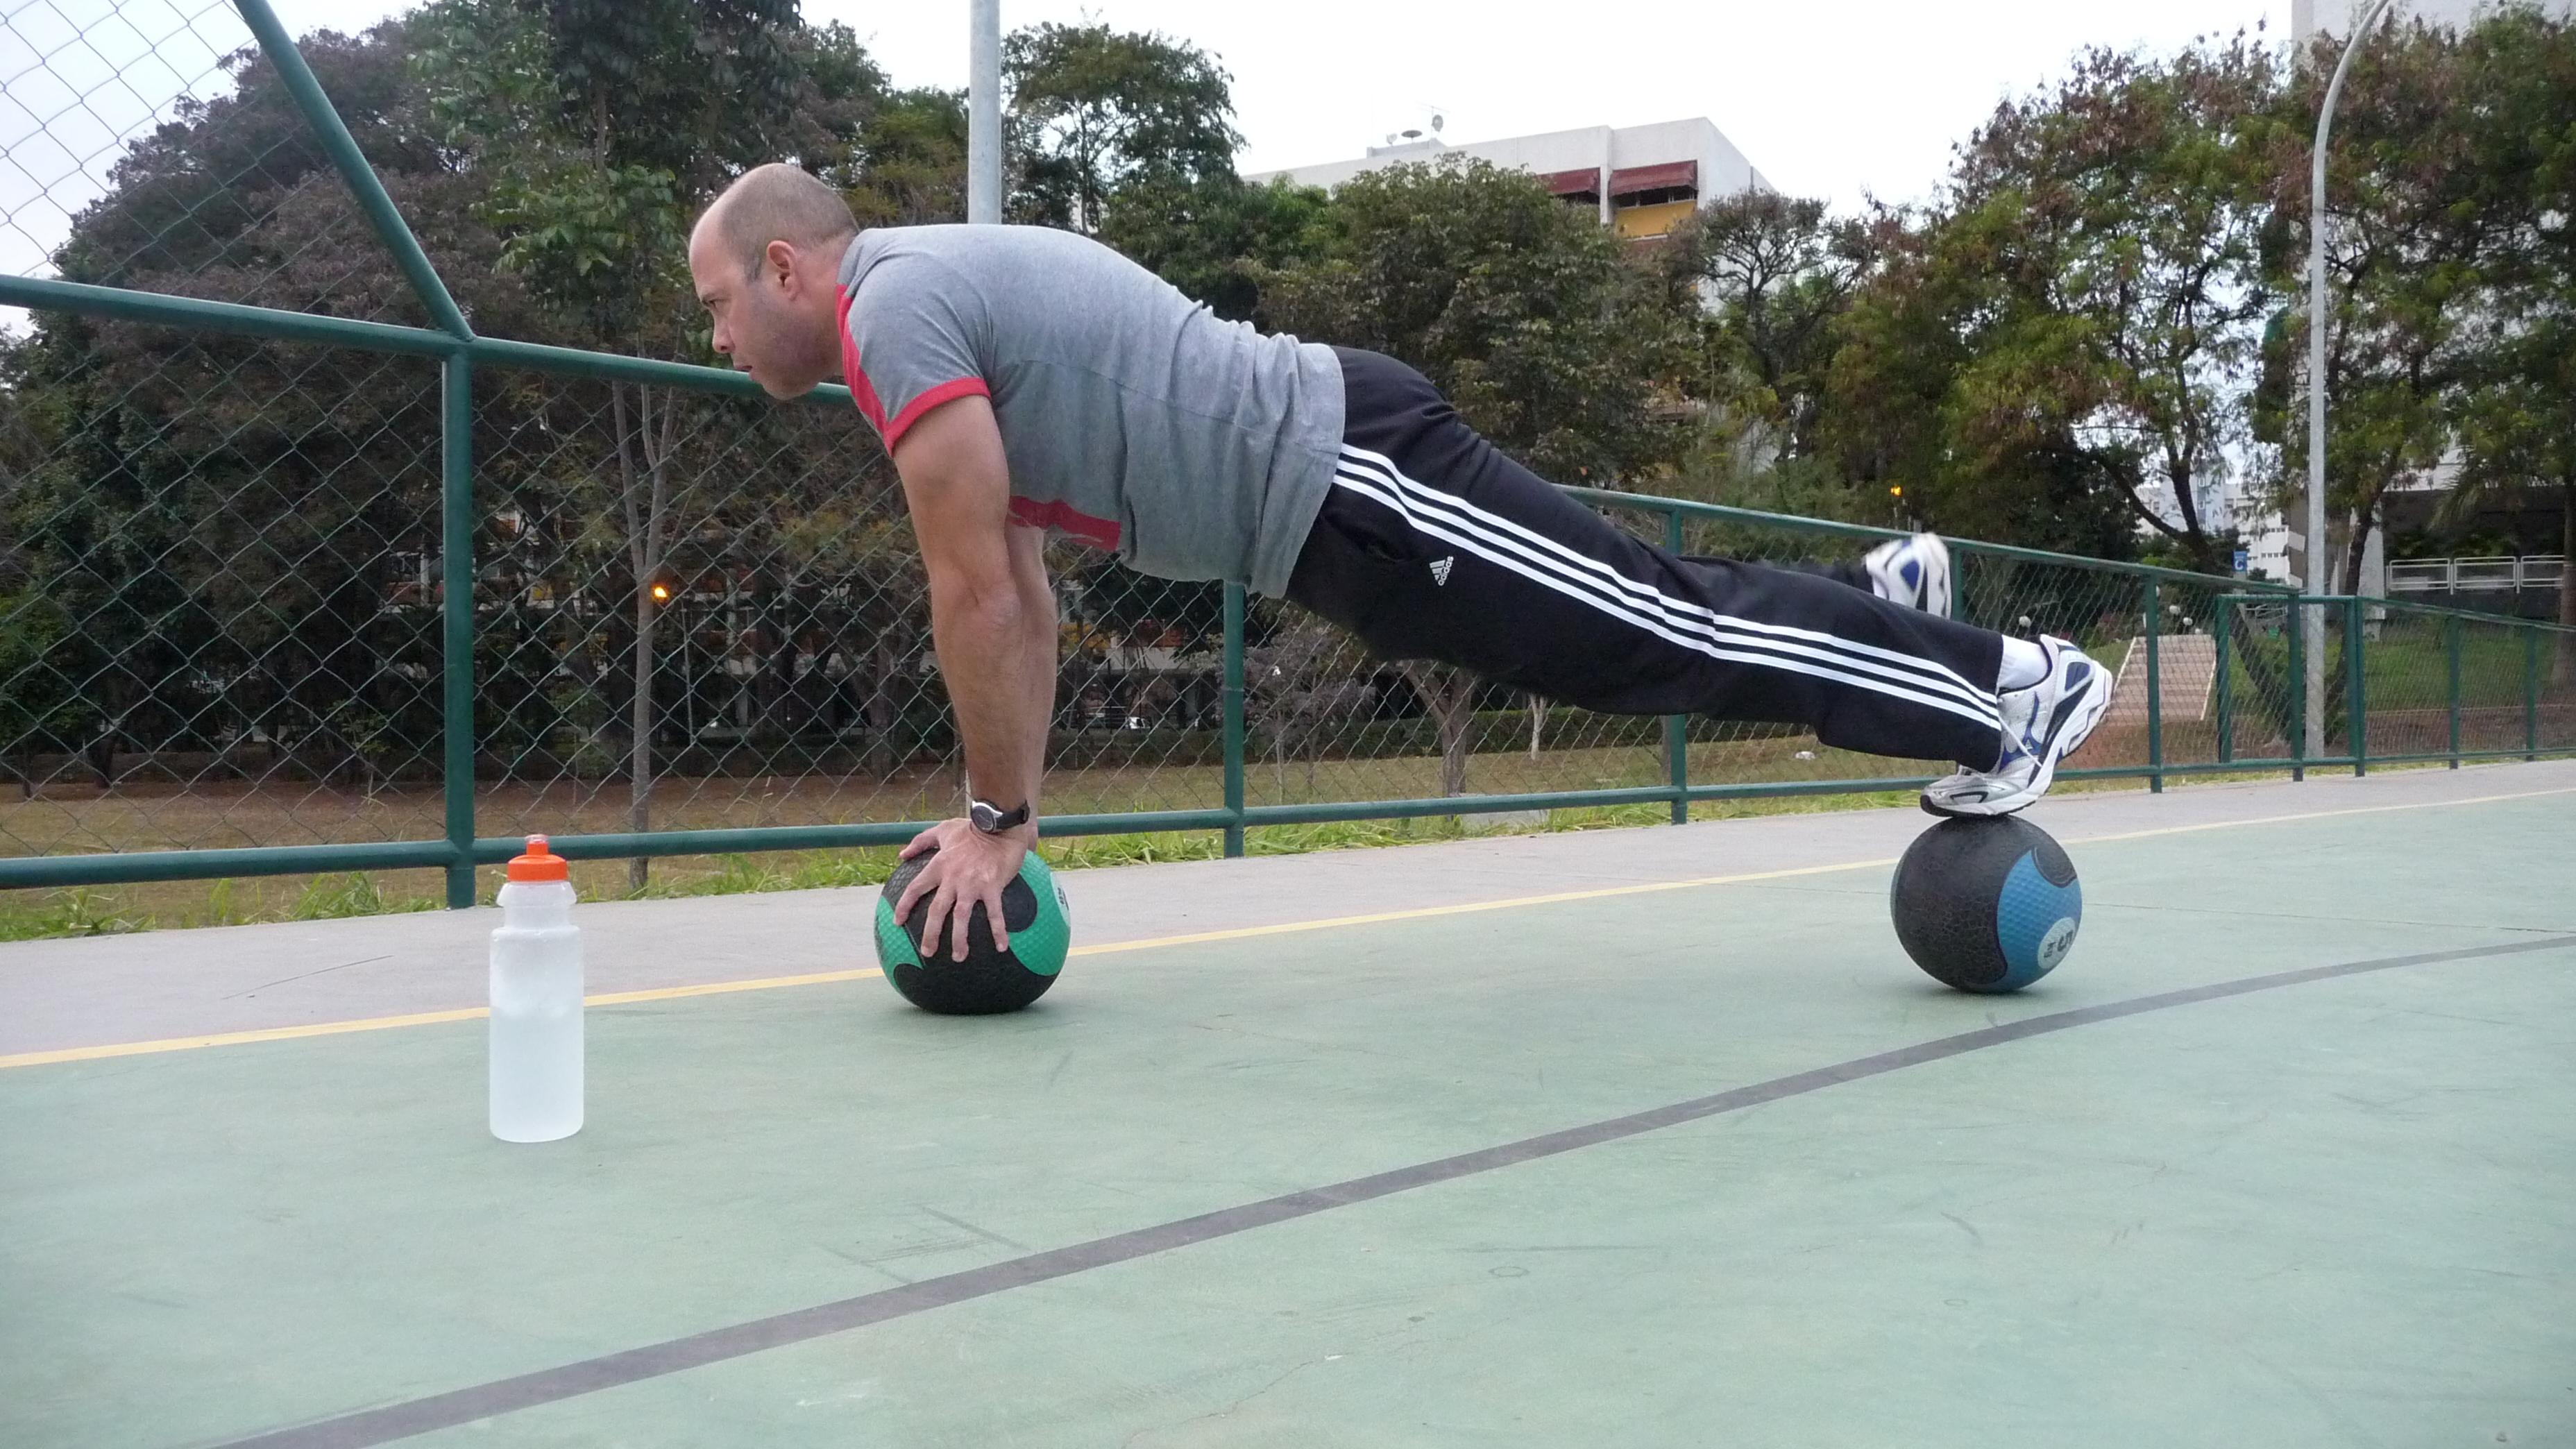 File:Medicine Ball Plank.jpg - Wikimedia Commons